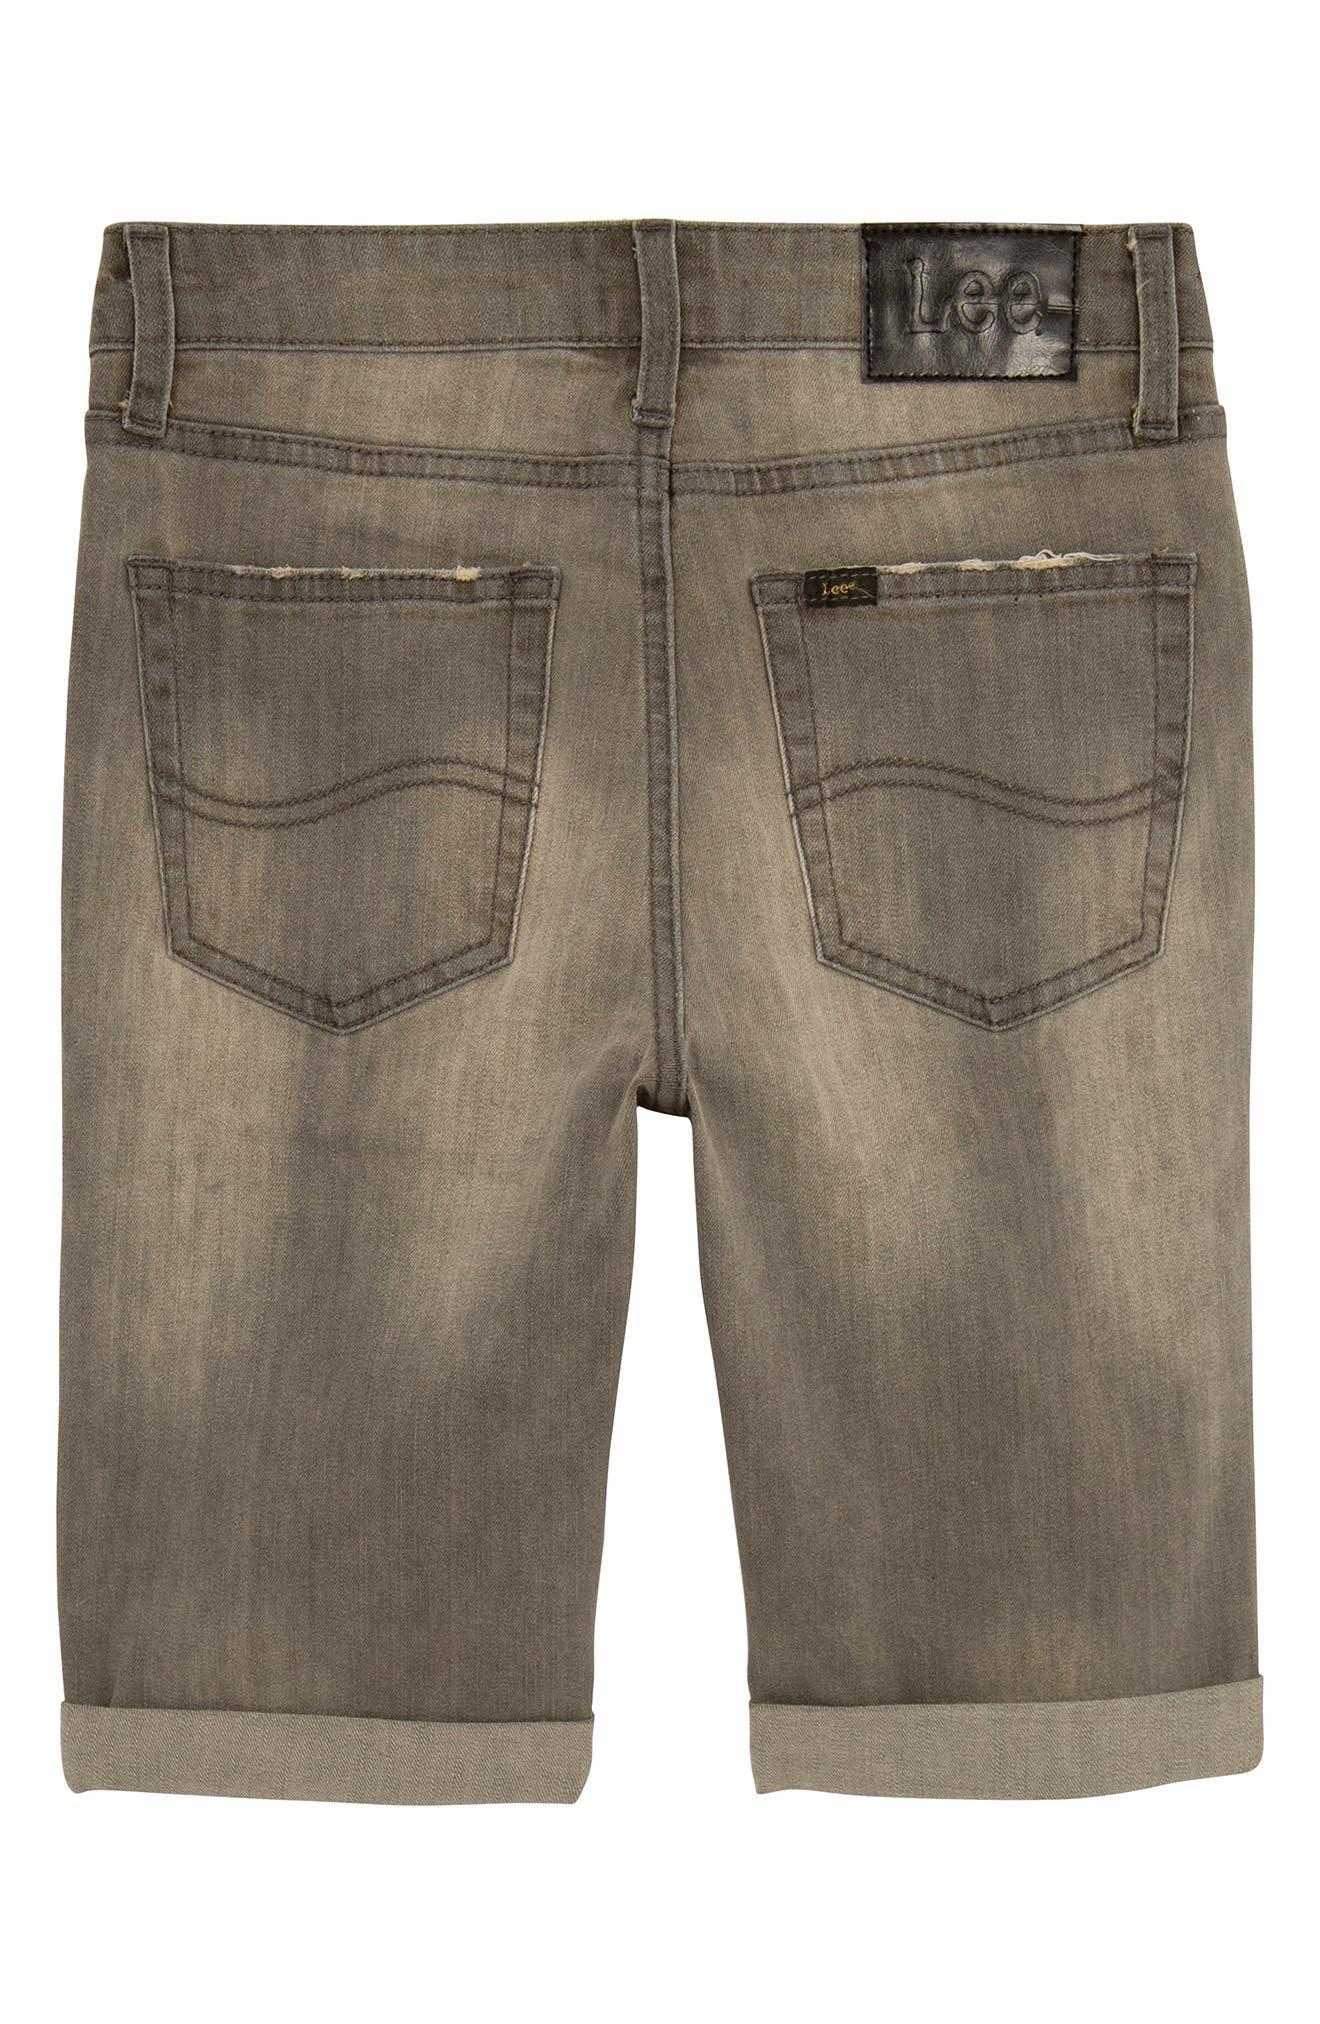 Straight Leg Cuffed Denim Shorts,                             Alternate thumbnail 2, color,                             060